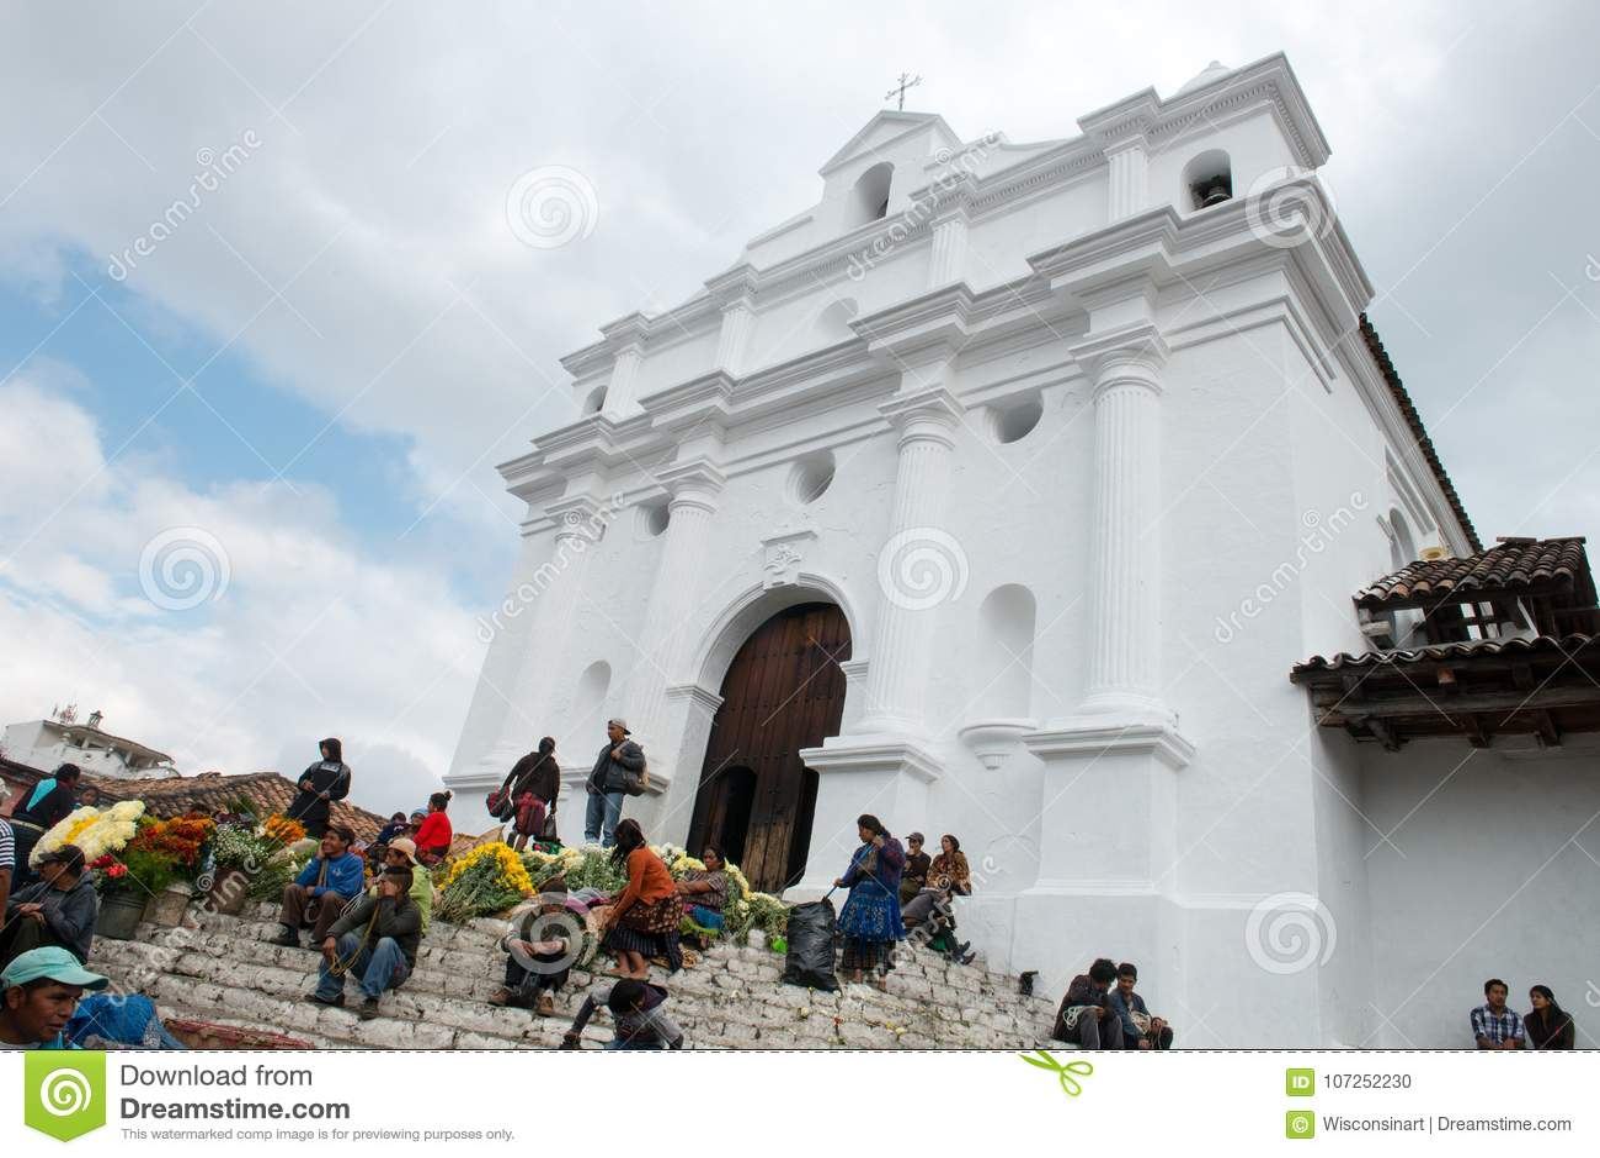 Santo Tomas教会, Guattemala旅行, Chichicastenengo